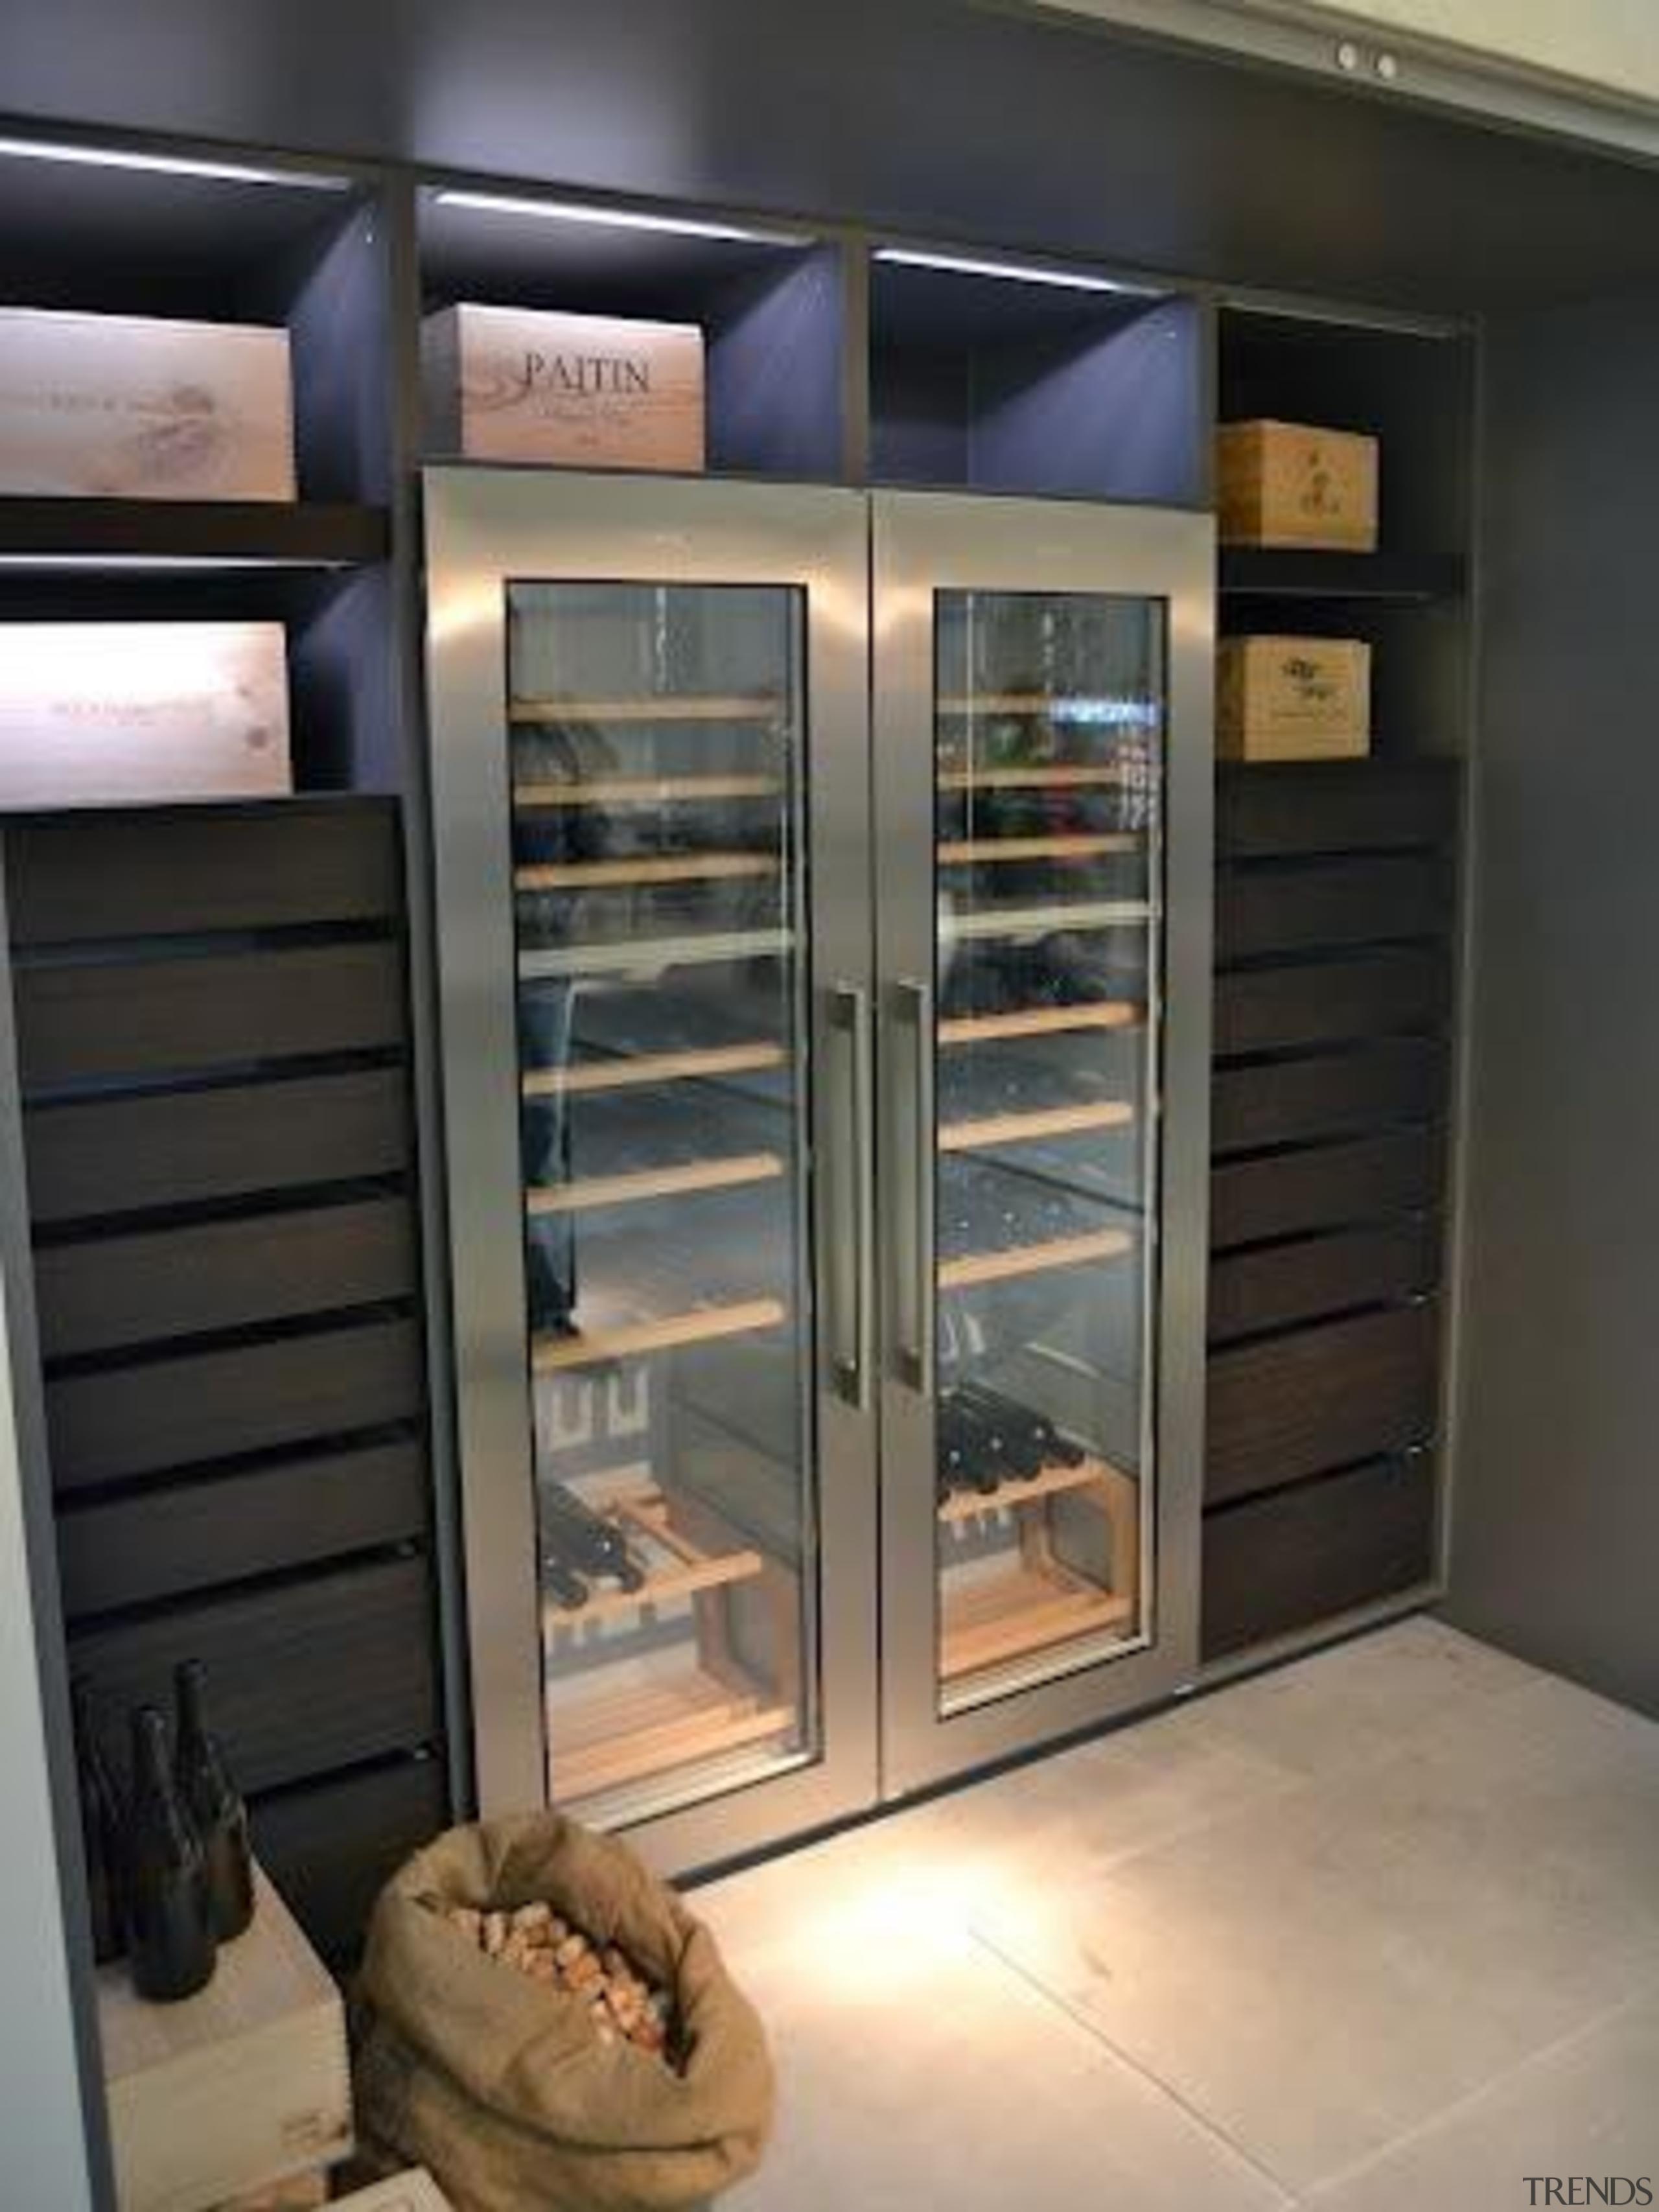 Modern Wine Cellar Ideas - Modern Wine Cellar display case, home appliance, kitchen appliance, major appliance, refrigerator, black, gray